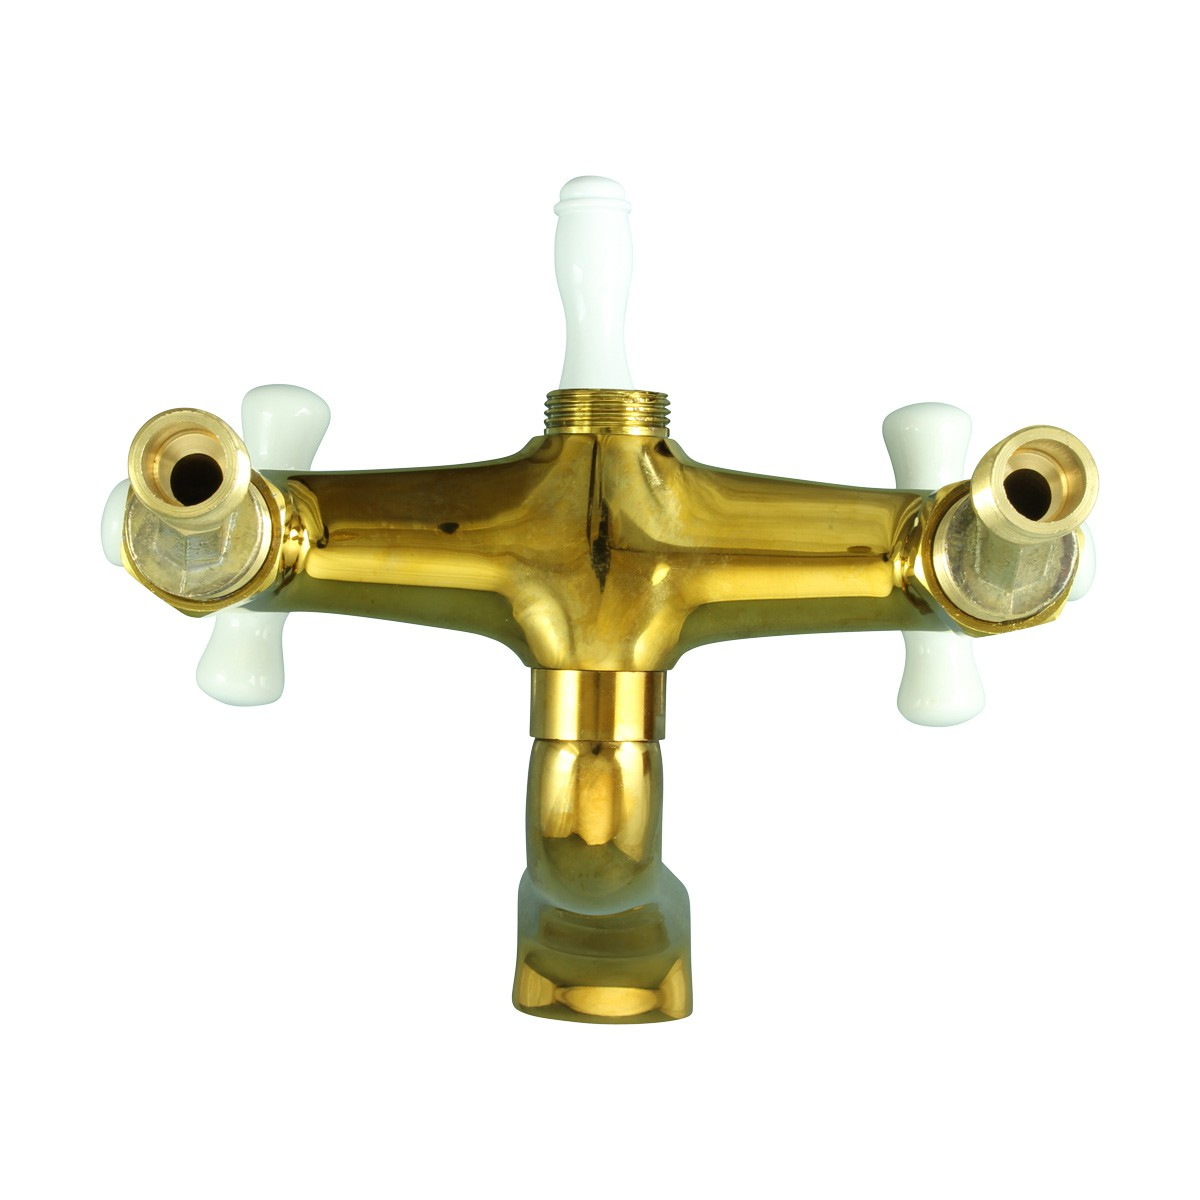 Tub Faucet Part PVD Brass Cross Handle Porcelain Bathroom Faucet Part Faucet Part Faucet Parts